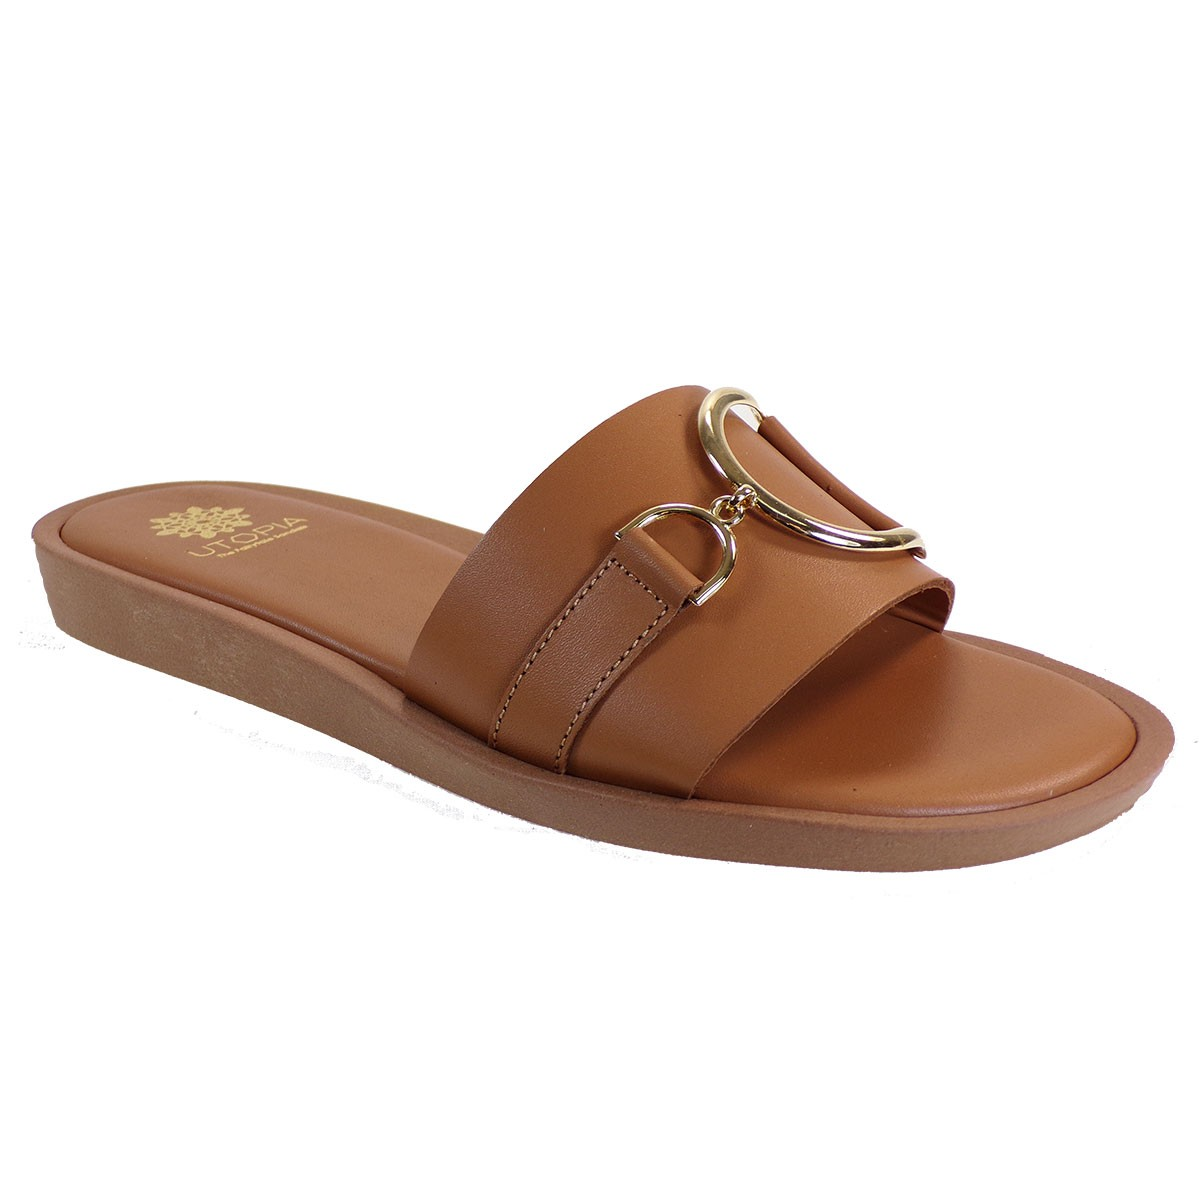 UTOPIA Γυναικεία Παπούτσια Παντόφλες U3-001 Ταμπά Δέρμα